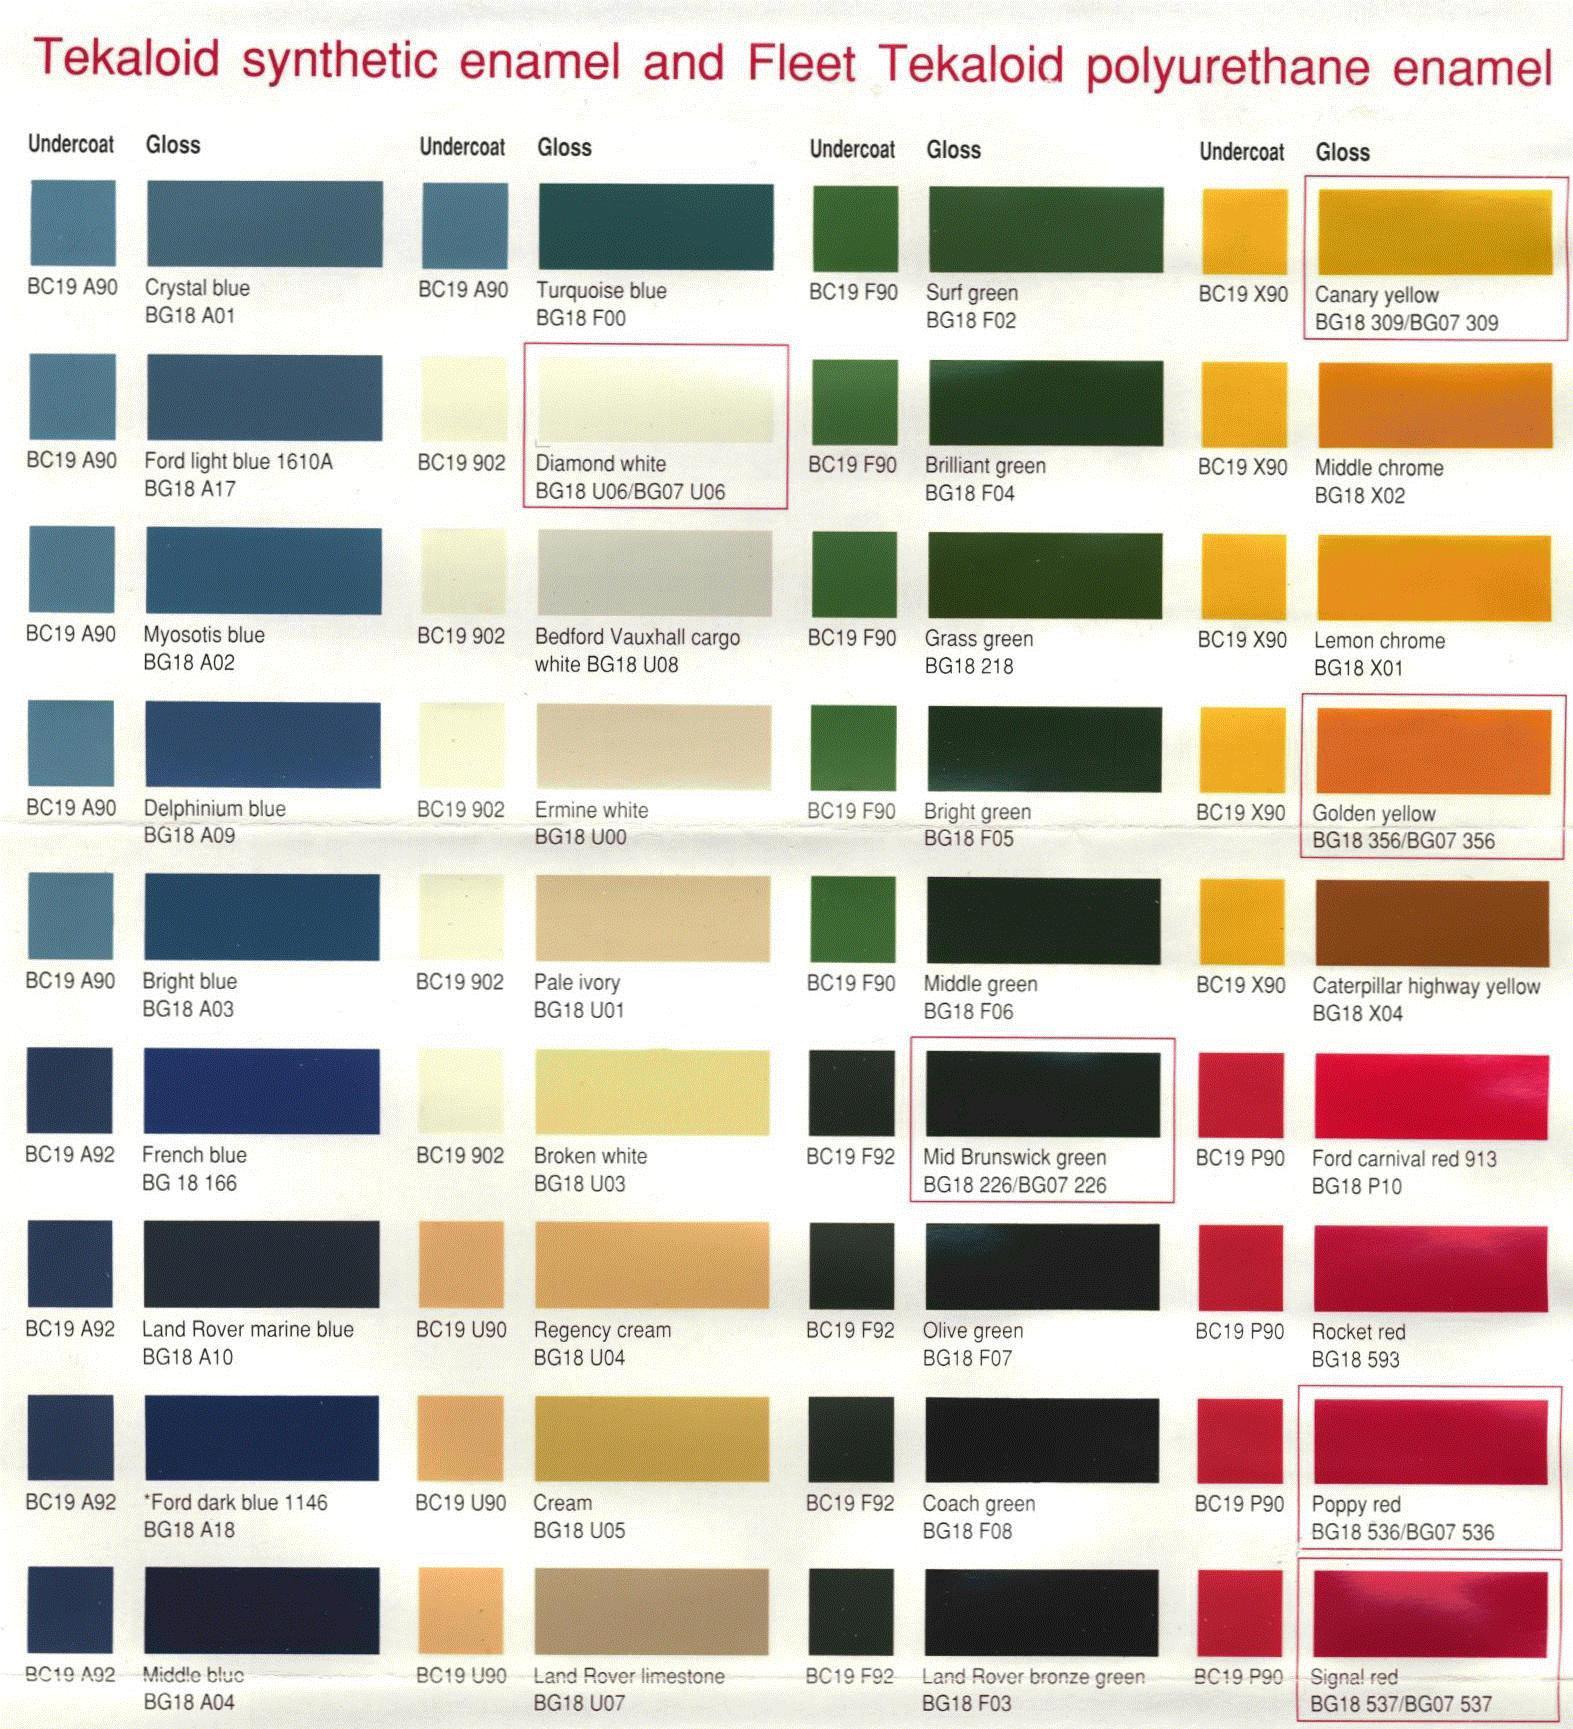 Ford Paint Color Chart >> Tekaloid coachpaint & varnish